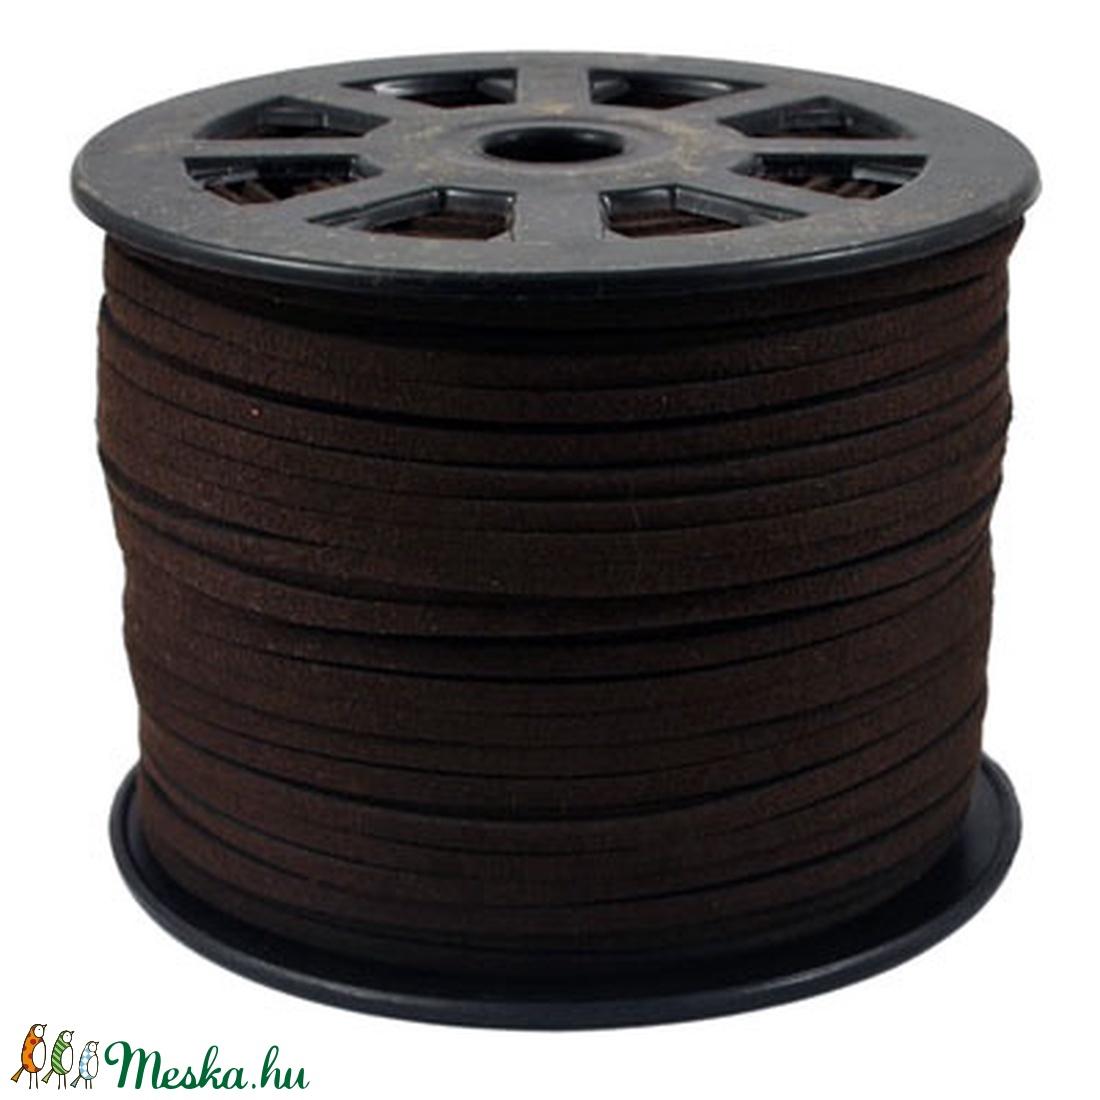 Szarvasbőr utánzat-8 (3x1,5 mm/1 m) - kakaóbarna (csimbo) - Meska.hu